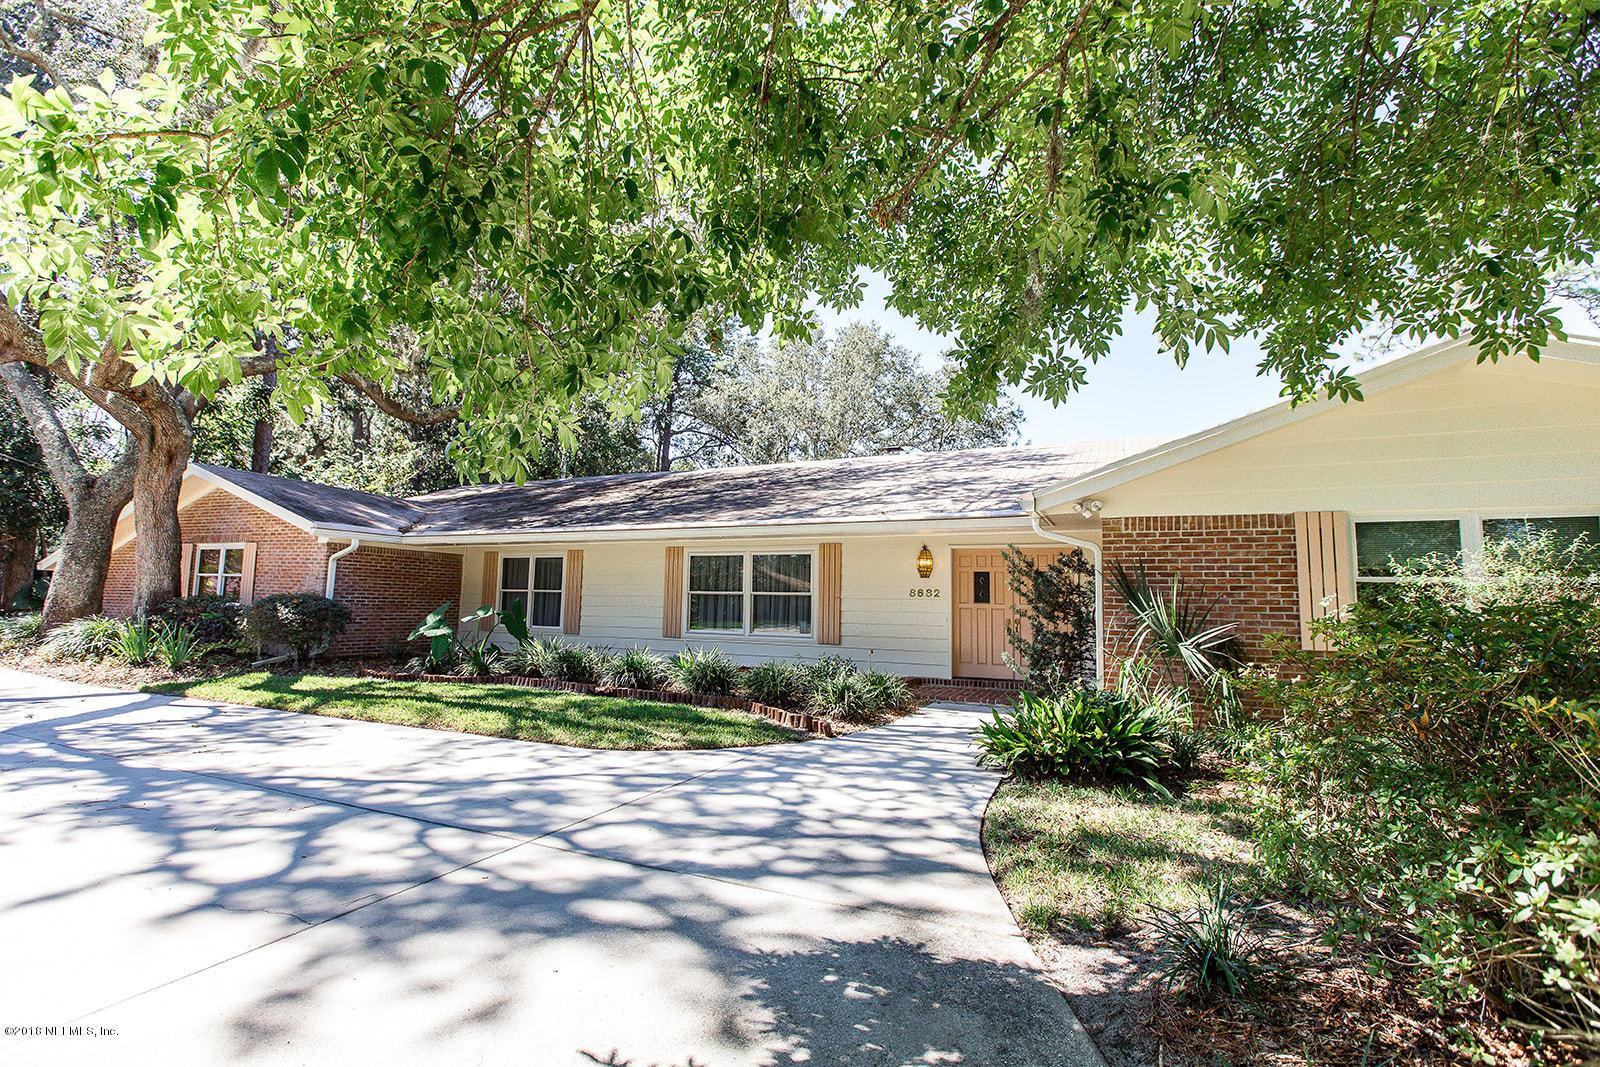 8682 SAN SERVERA, JACKSONVILLE, FLORIDA 32217, 4 Bedrooms Bedrooms, ,3 BathroomsBathrooms,Residential - single family,For sale,SAN SERVERA,962240